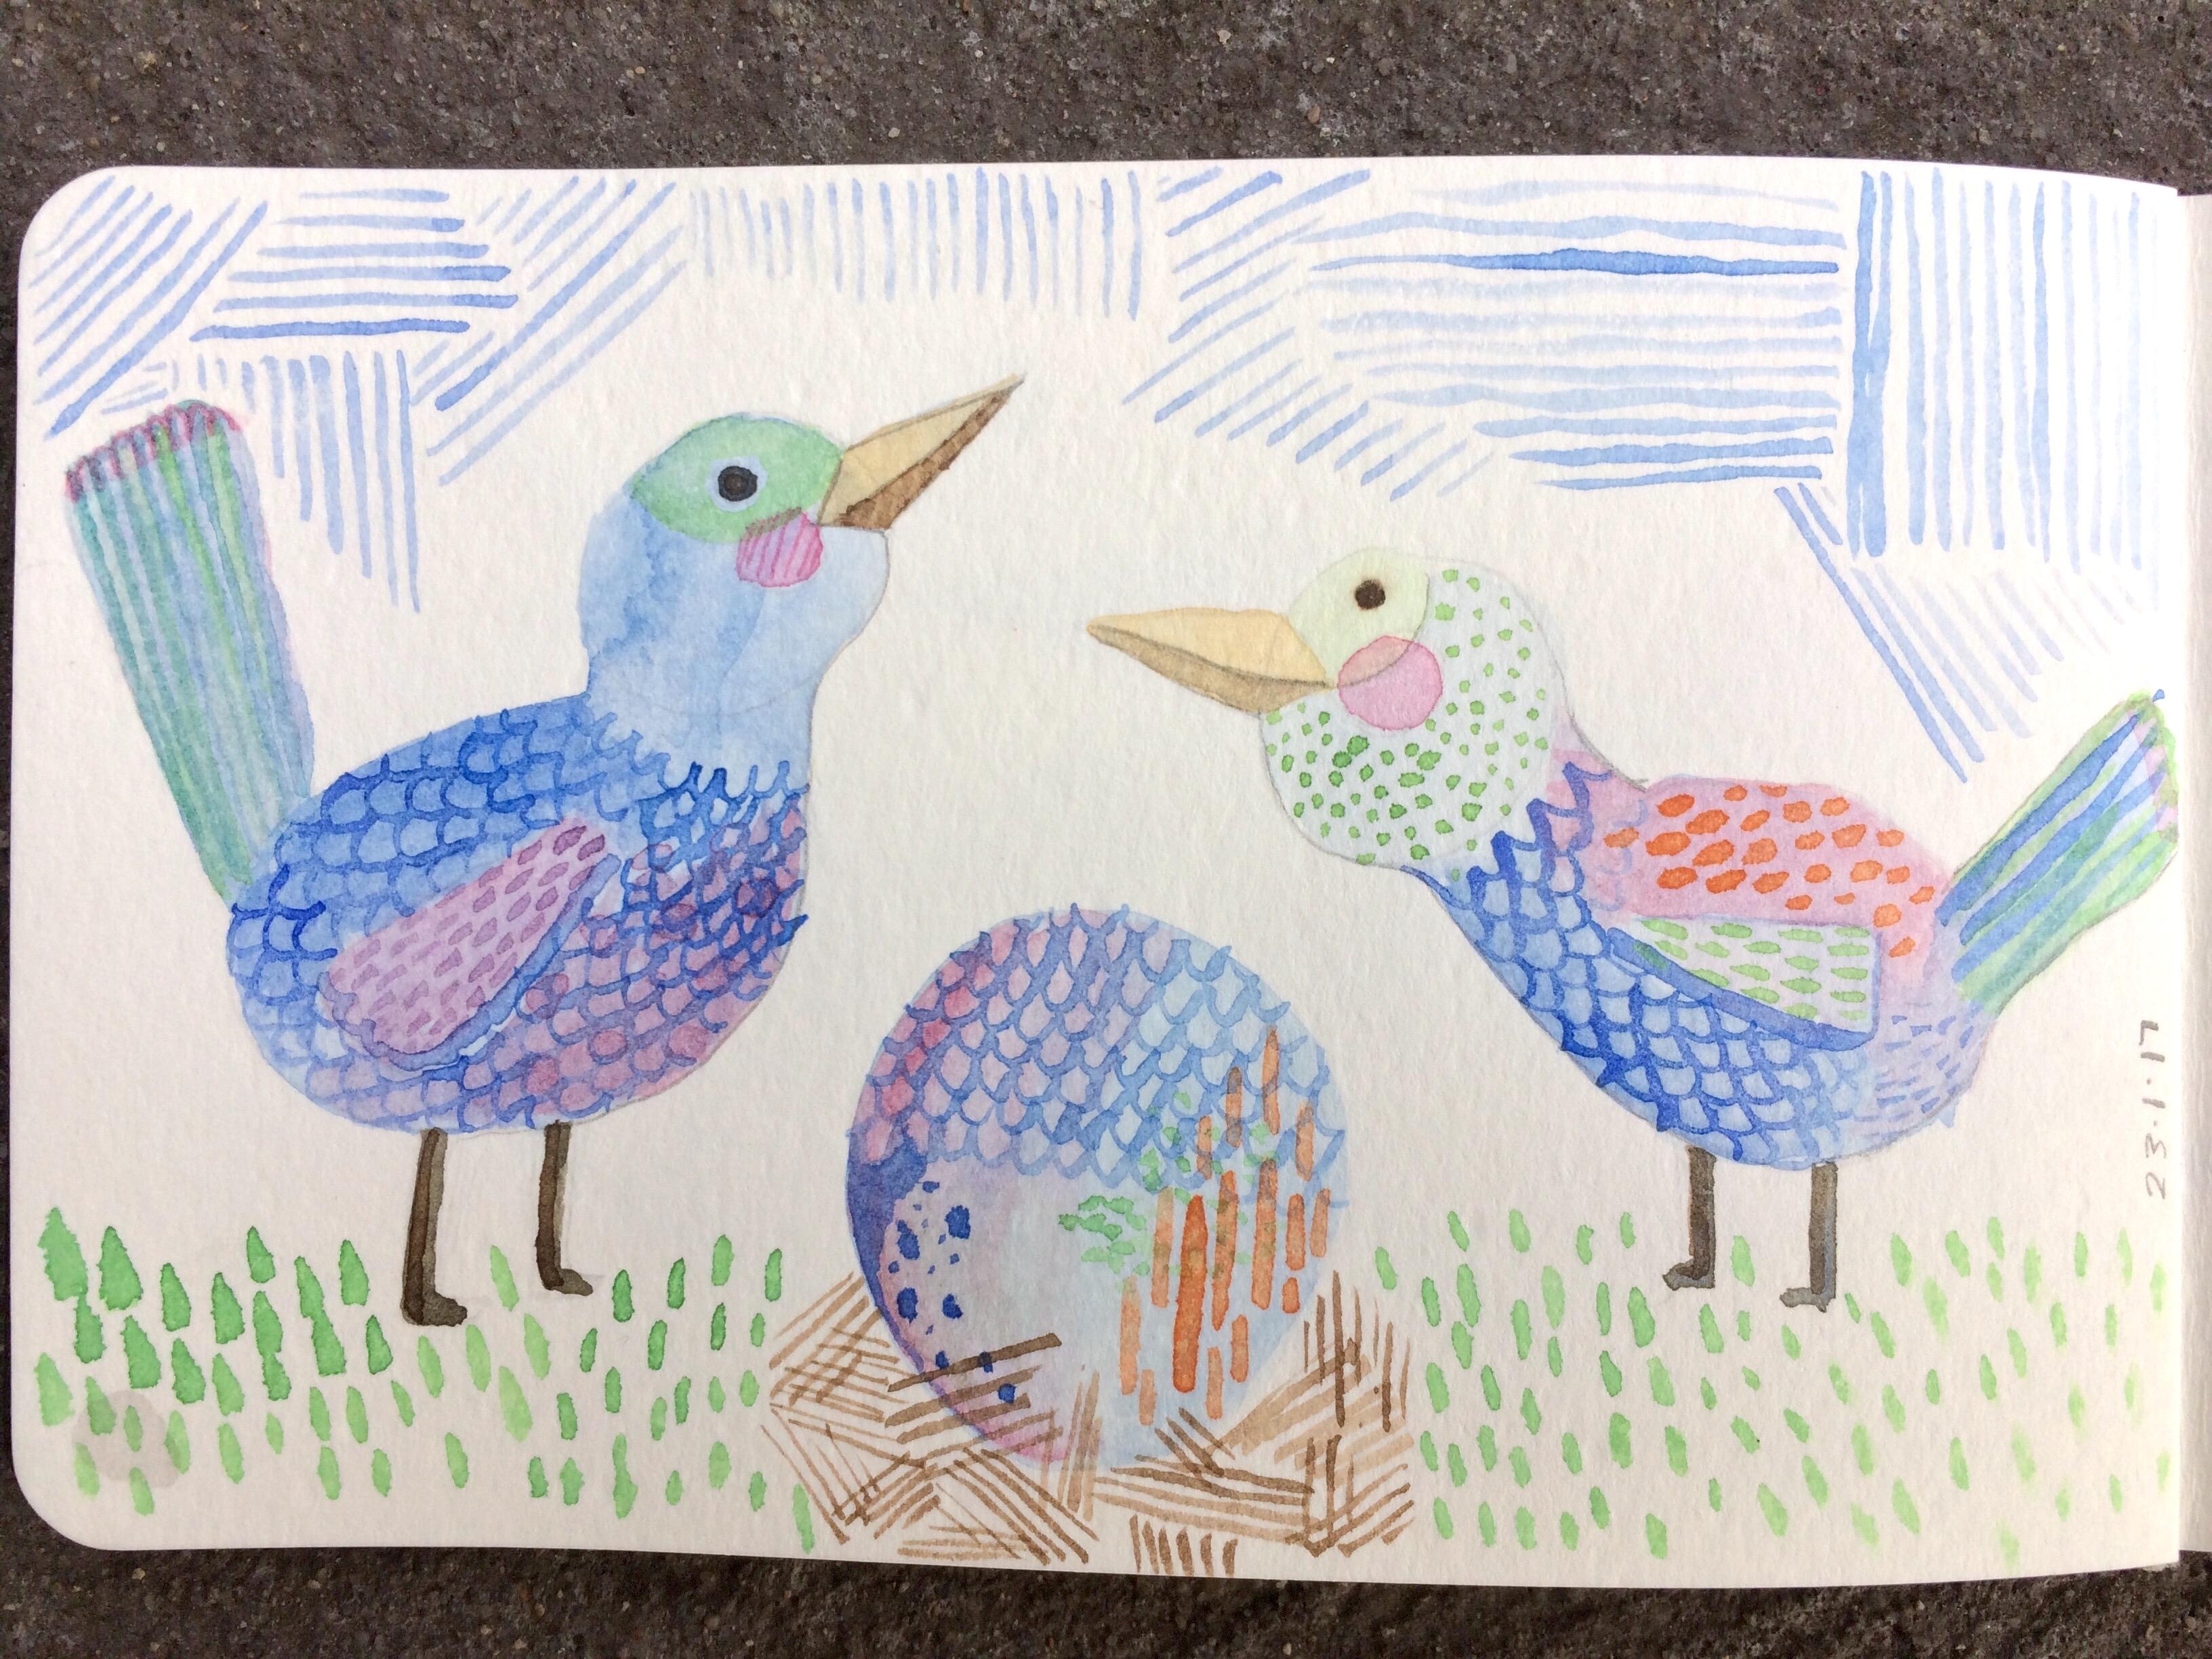 Daily watercolour - Birds by Amie Sabadin